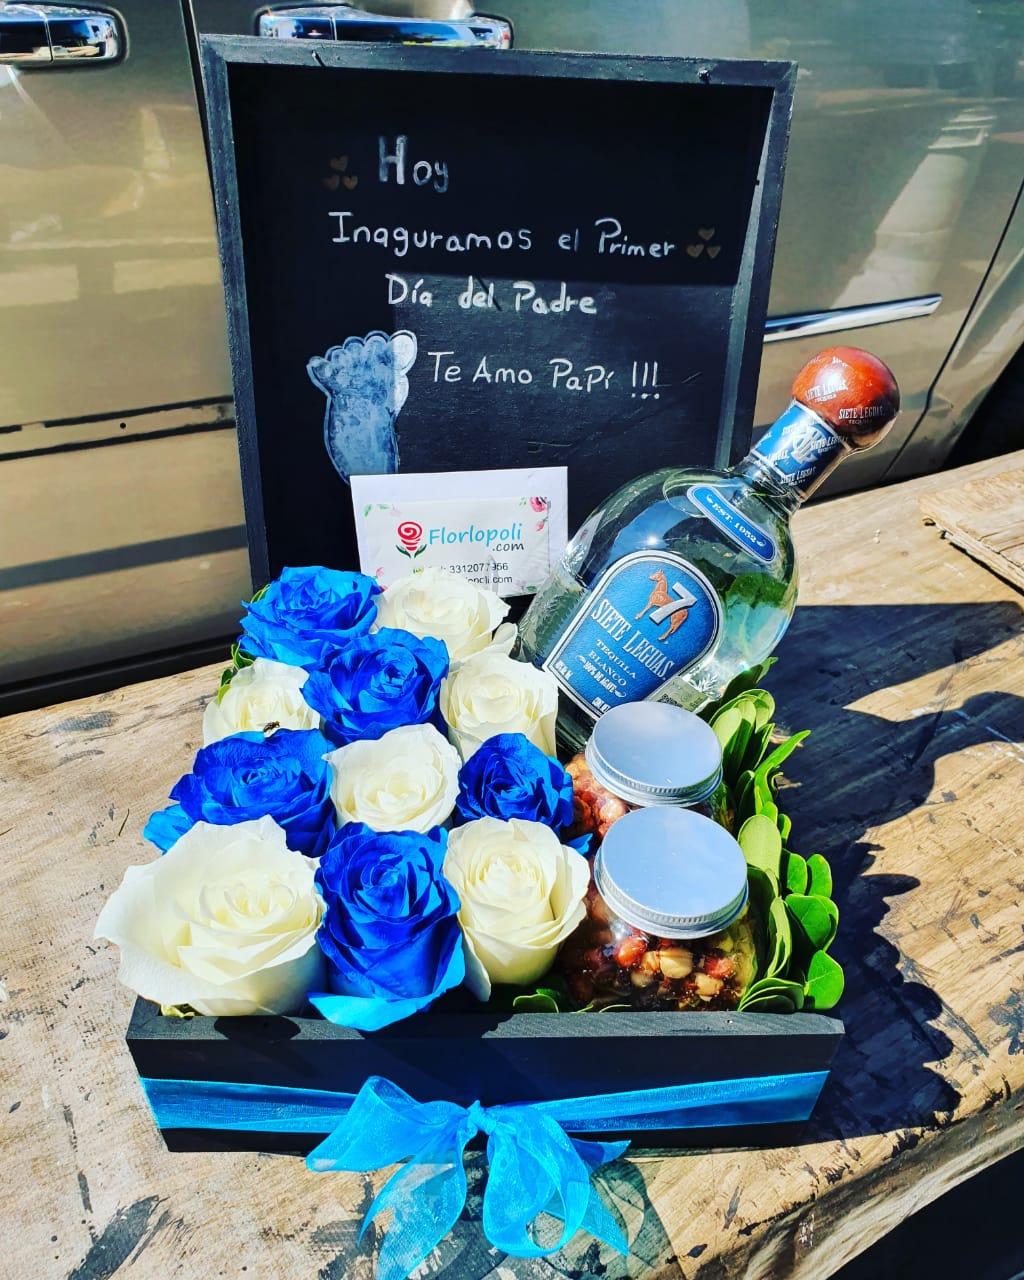 Caja de rosas, botana y botella